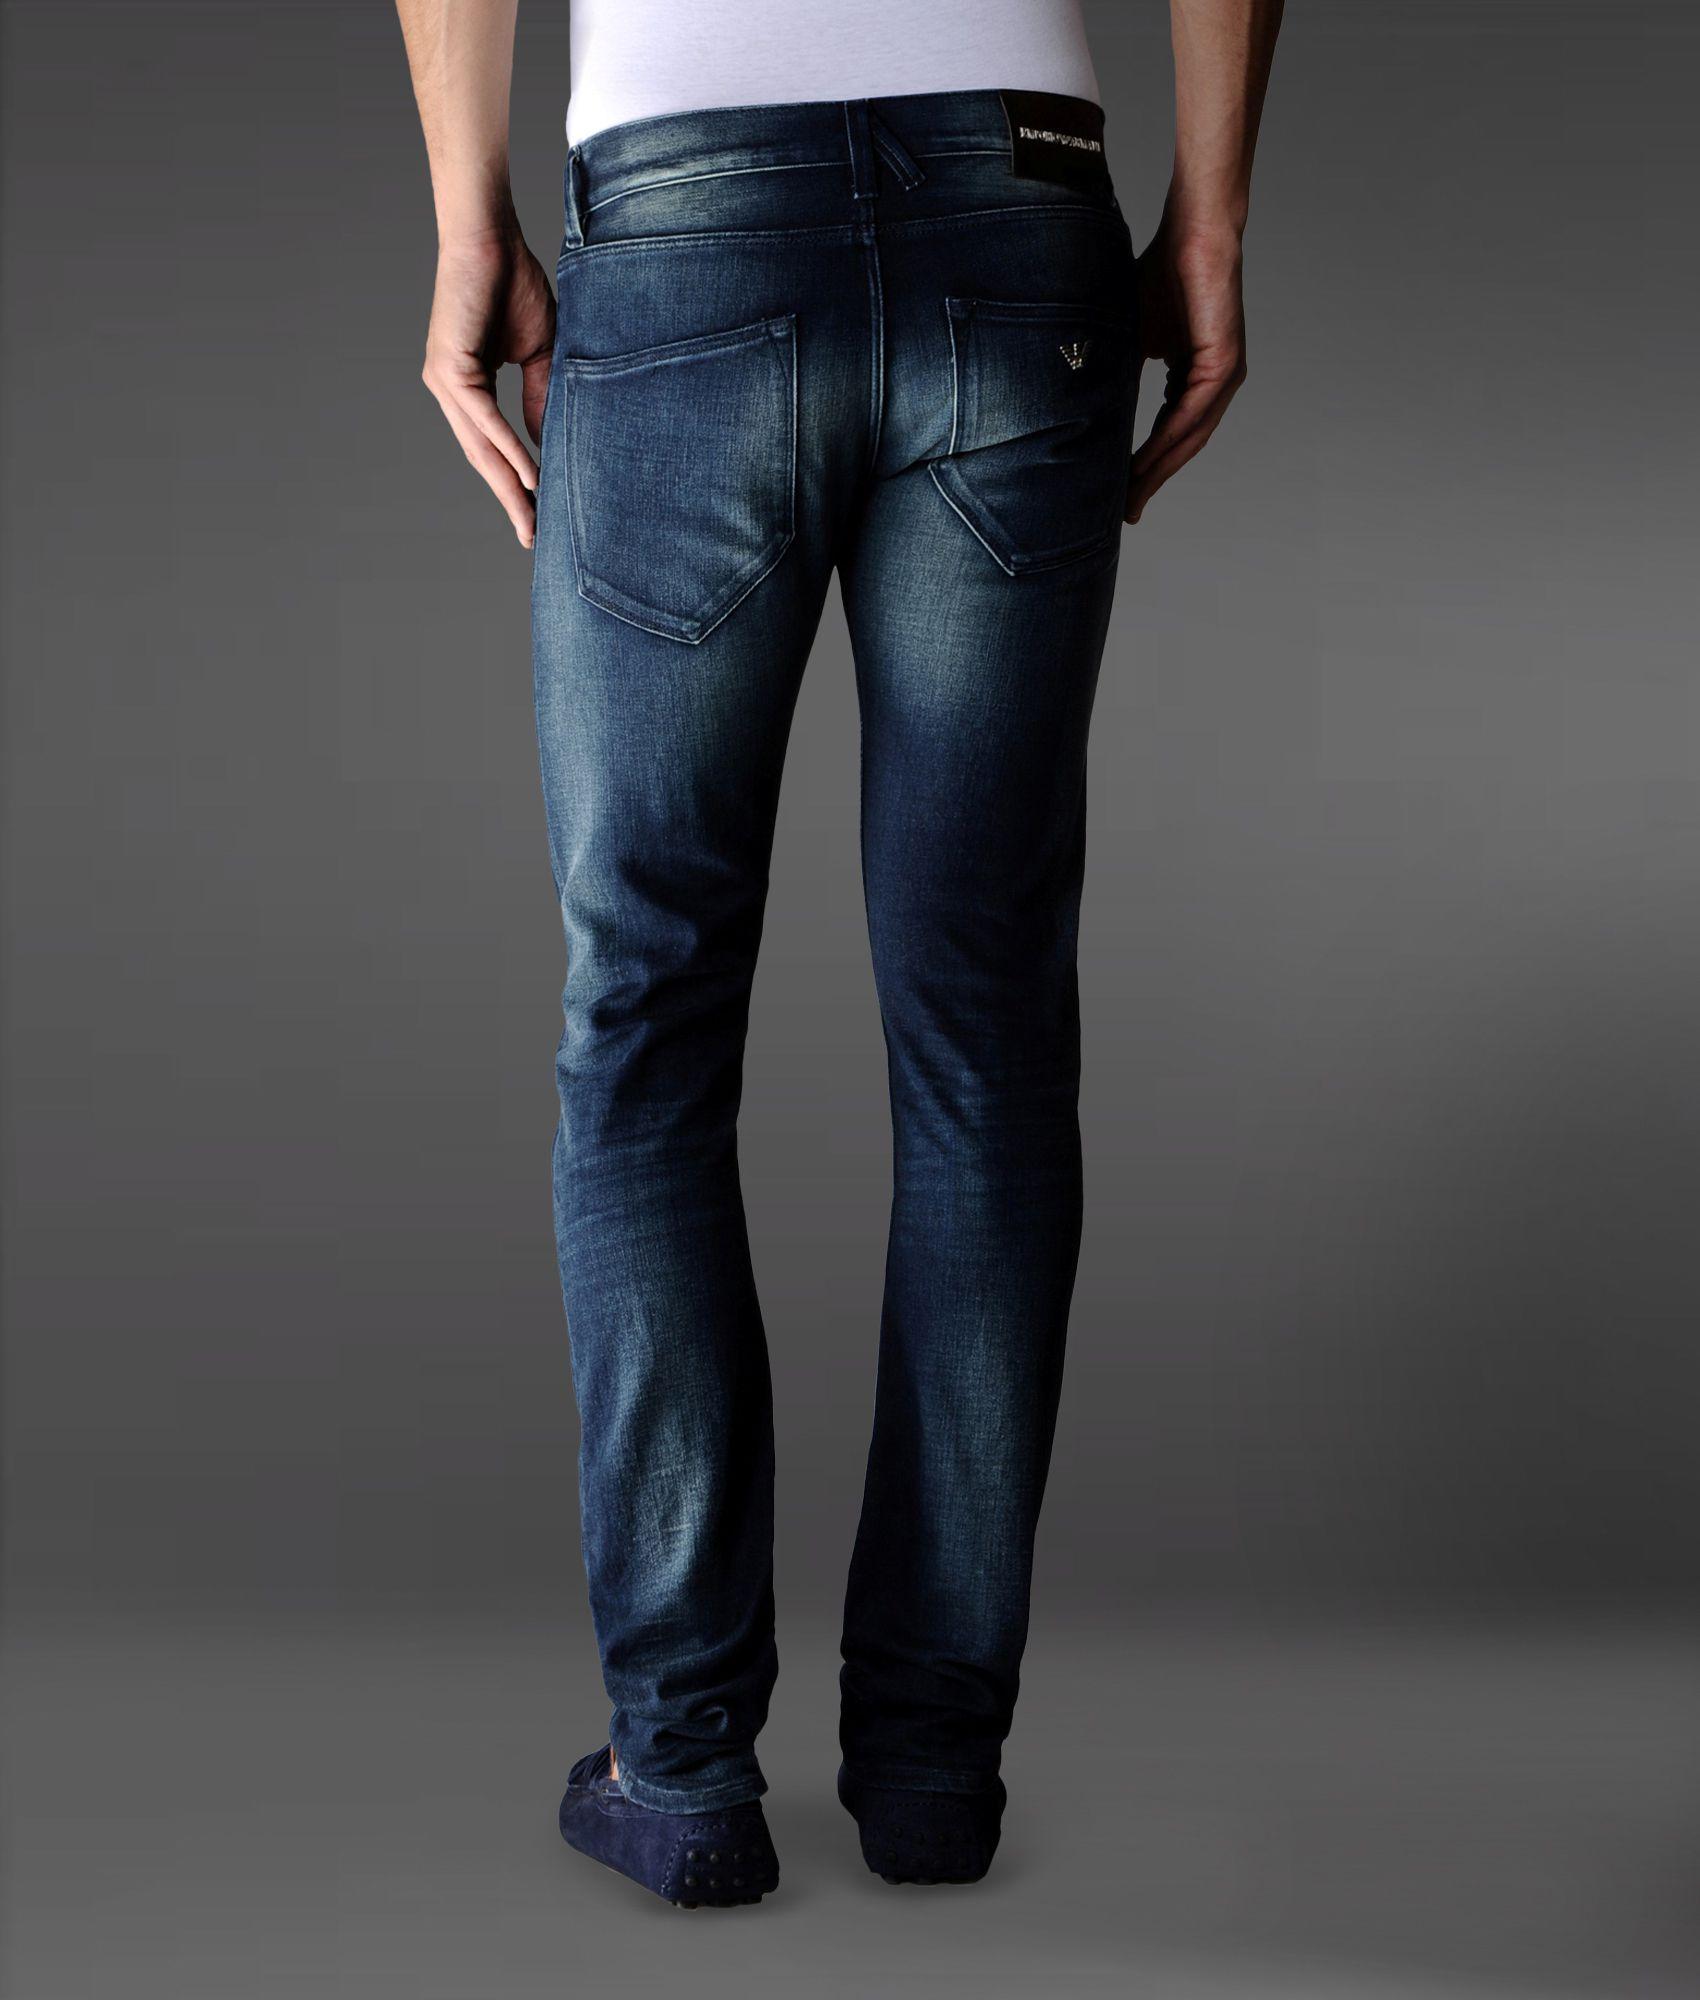 classic slim-fit jeans - Blue Emporio Armani bugkDE6Ct